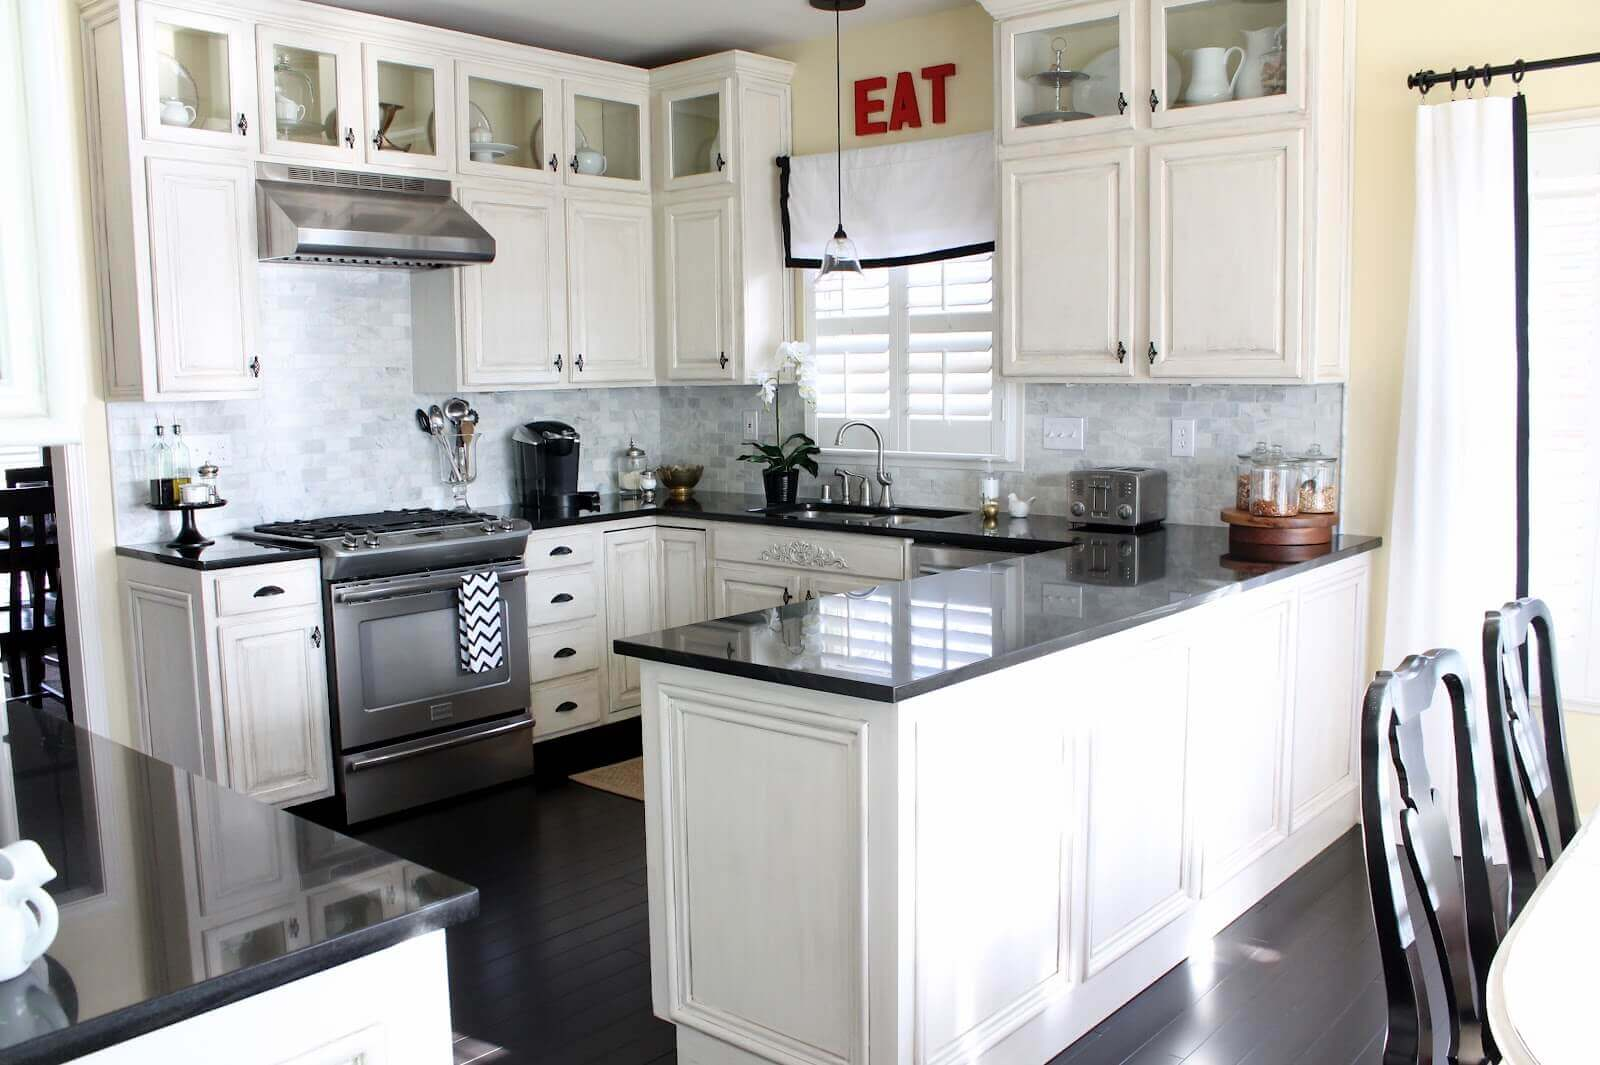 Modern White Kitchen with Black Countertop